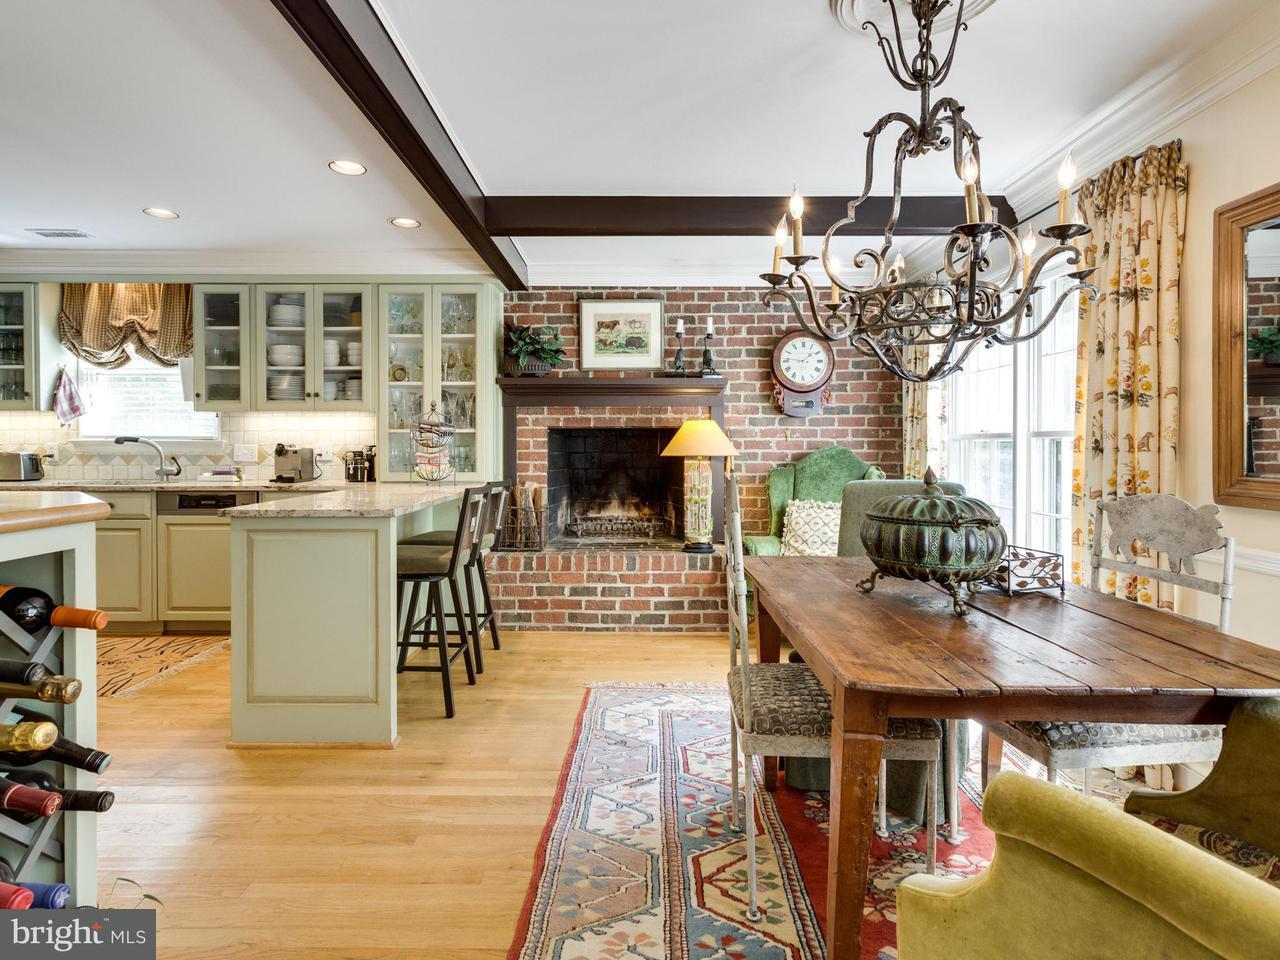 Single Family Home for Sale at 7028 Arbor Lane 7028 Arbor Lane McLean, Virginia 22101 United States